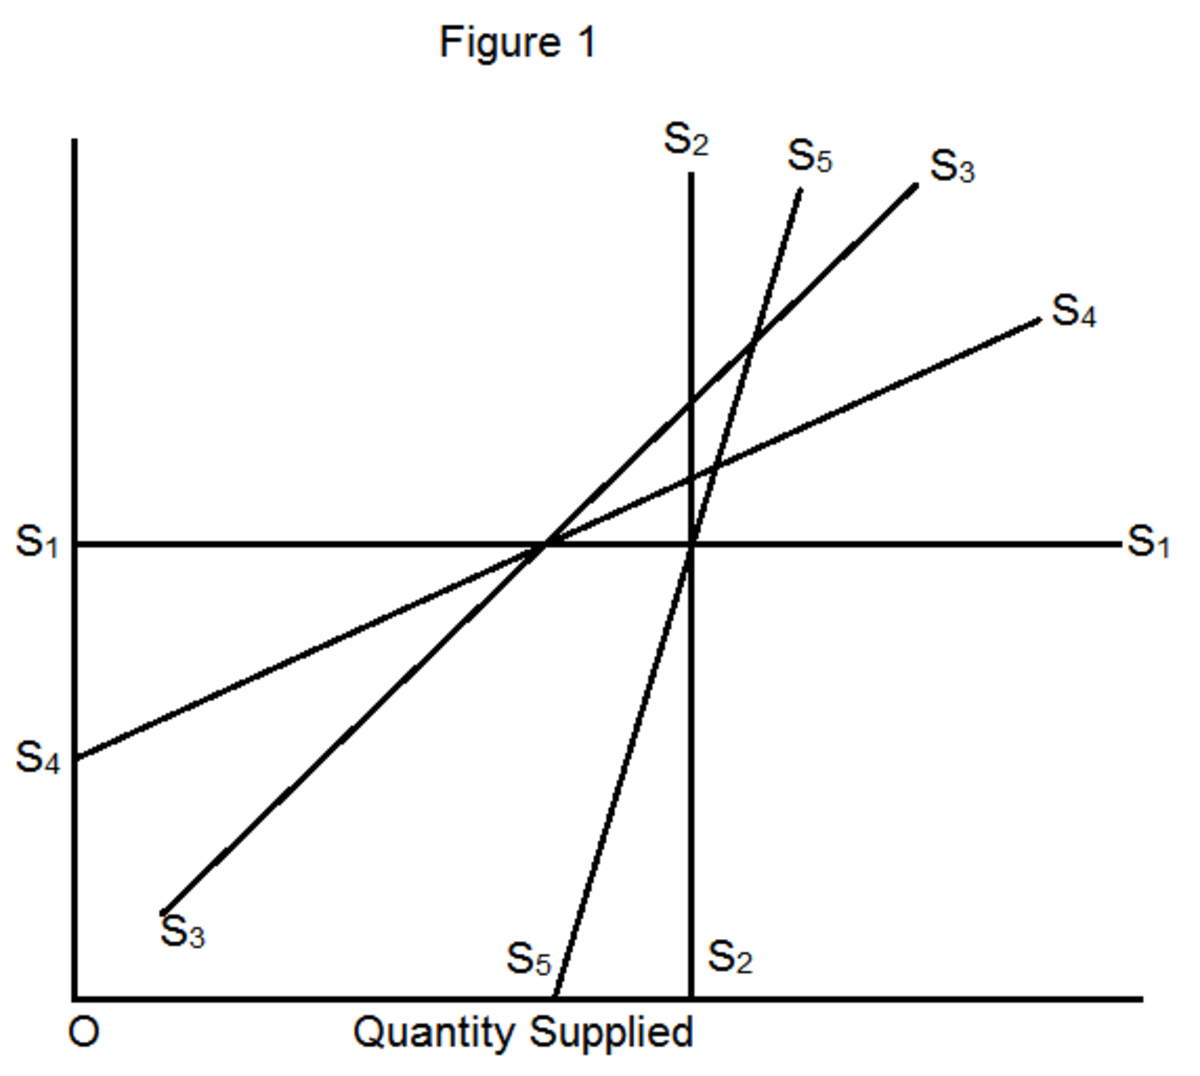 Determinant of supply elasticity